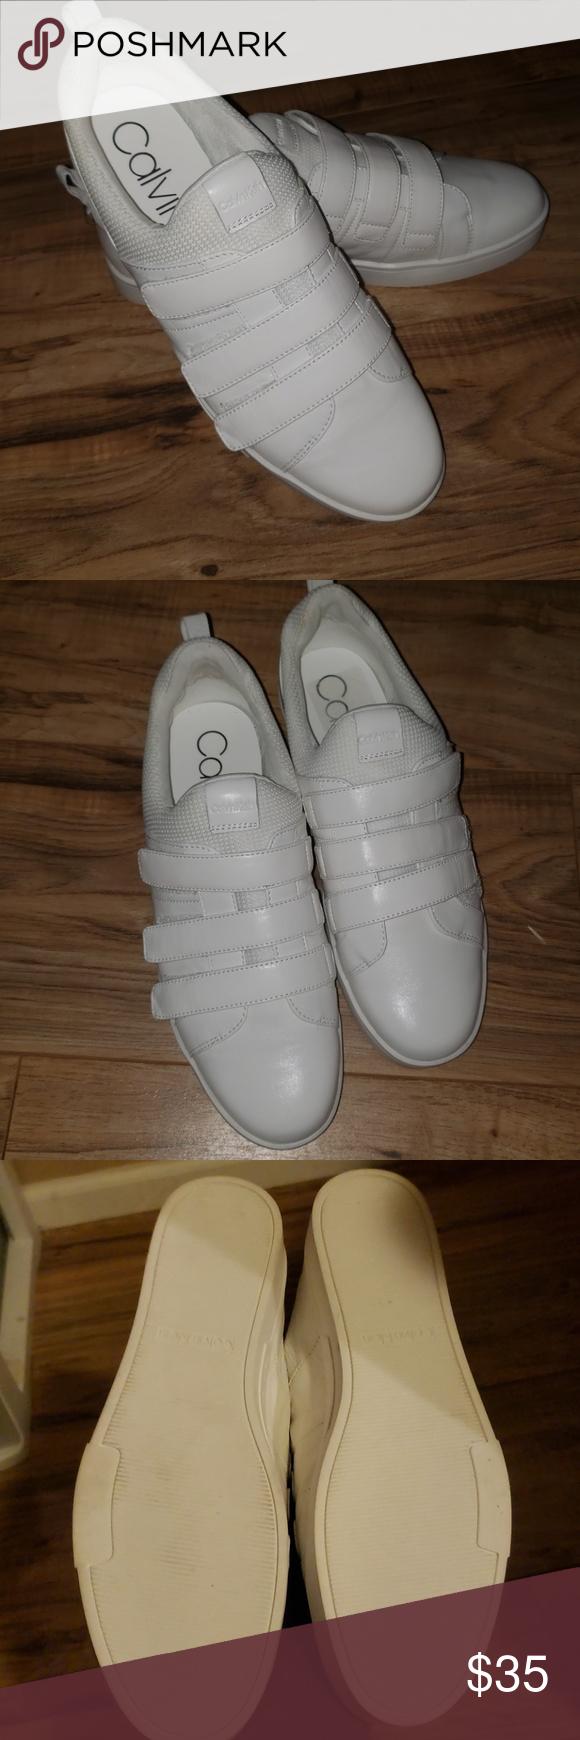 Calvin klein irah white velcro sneakers